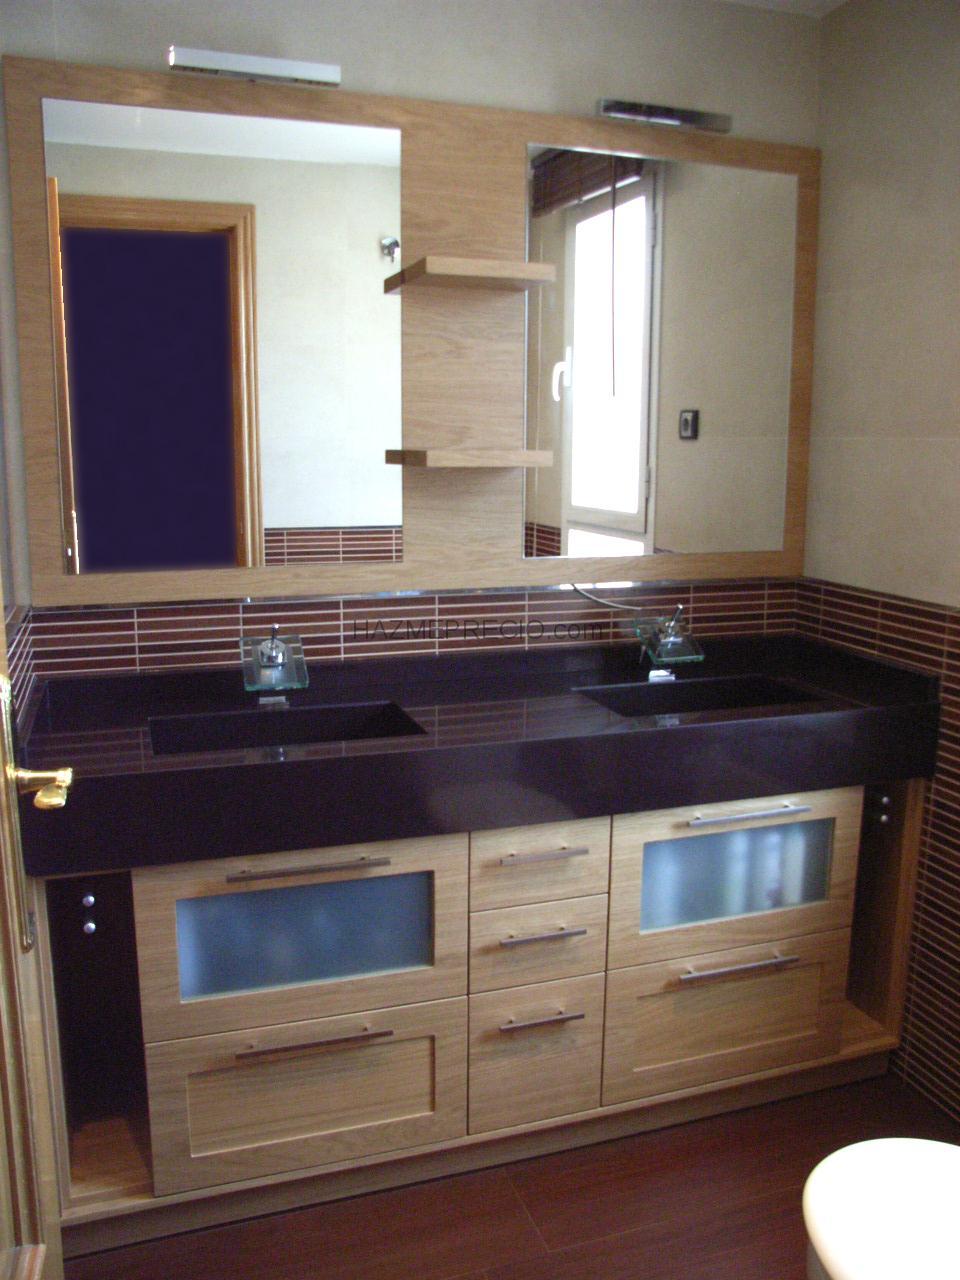 Imagenes de muebles de ba o de obra for Bajo lavabo de obra